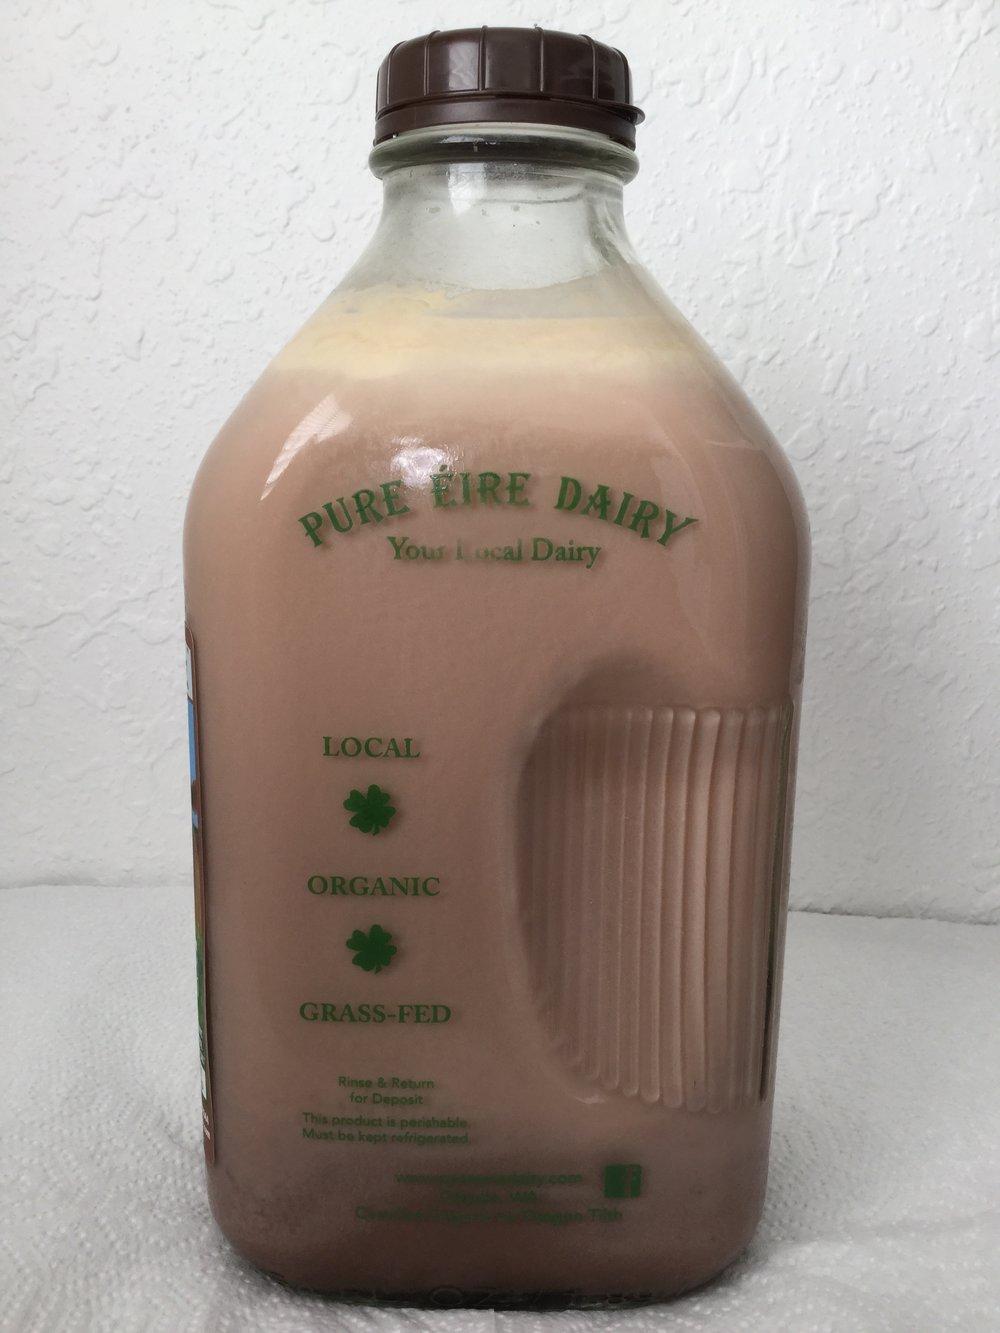 Pure Eire Organic Chocolate Milk Side 1